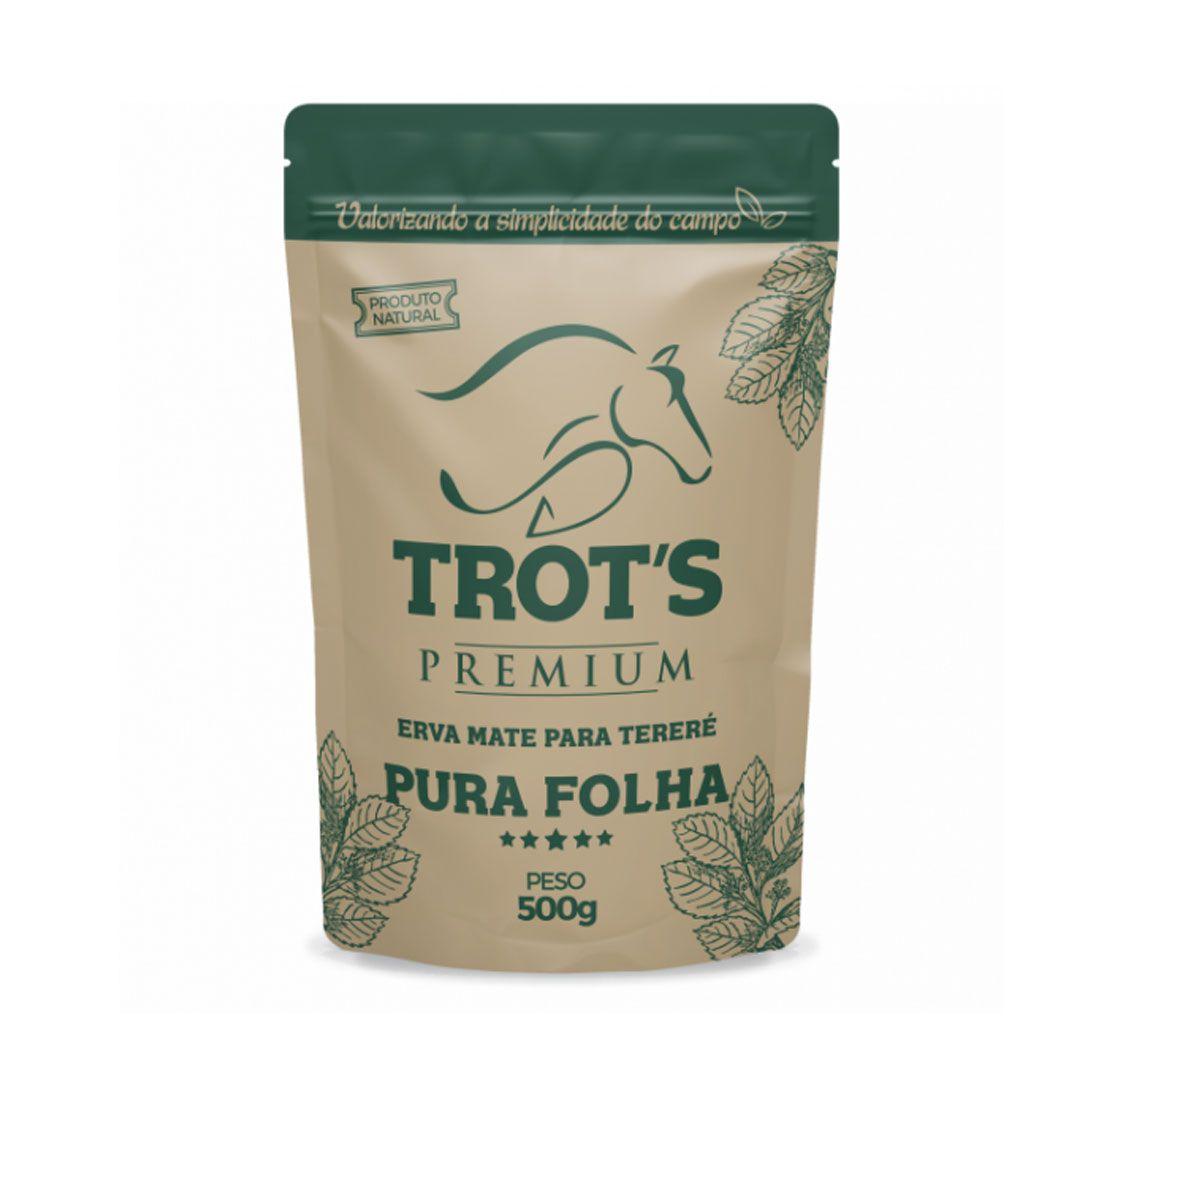 Erva Mate Trot's Premium para Tereré Pura Folha 500g